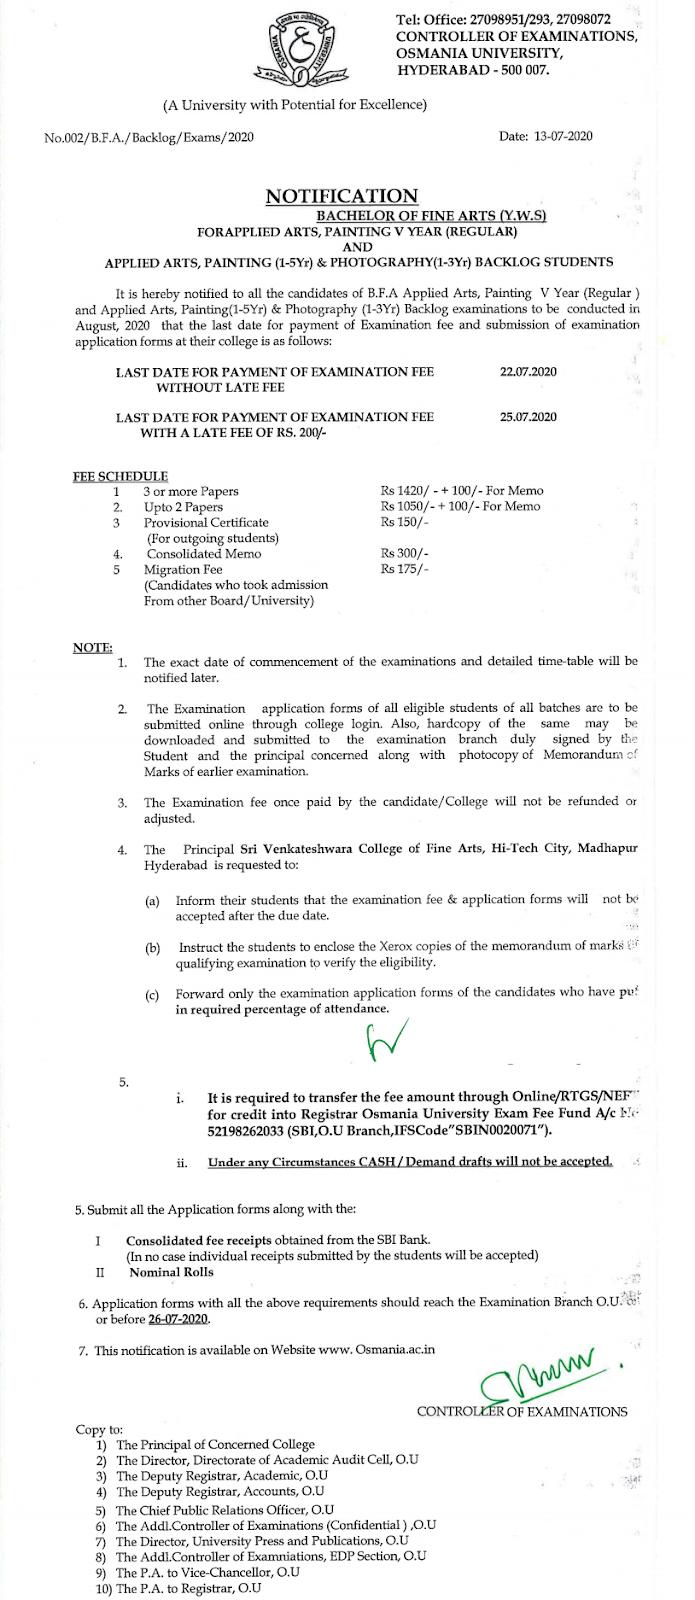 Osmania University BFA (Applied Arts, Painting) 5th Yr Reg & All Backlog August 2020 Exam Fee Notification